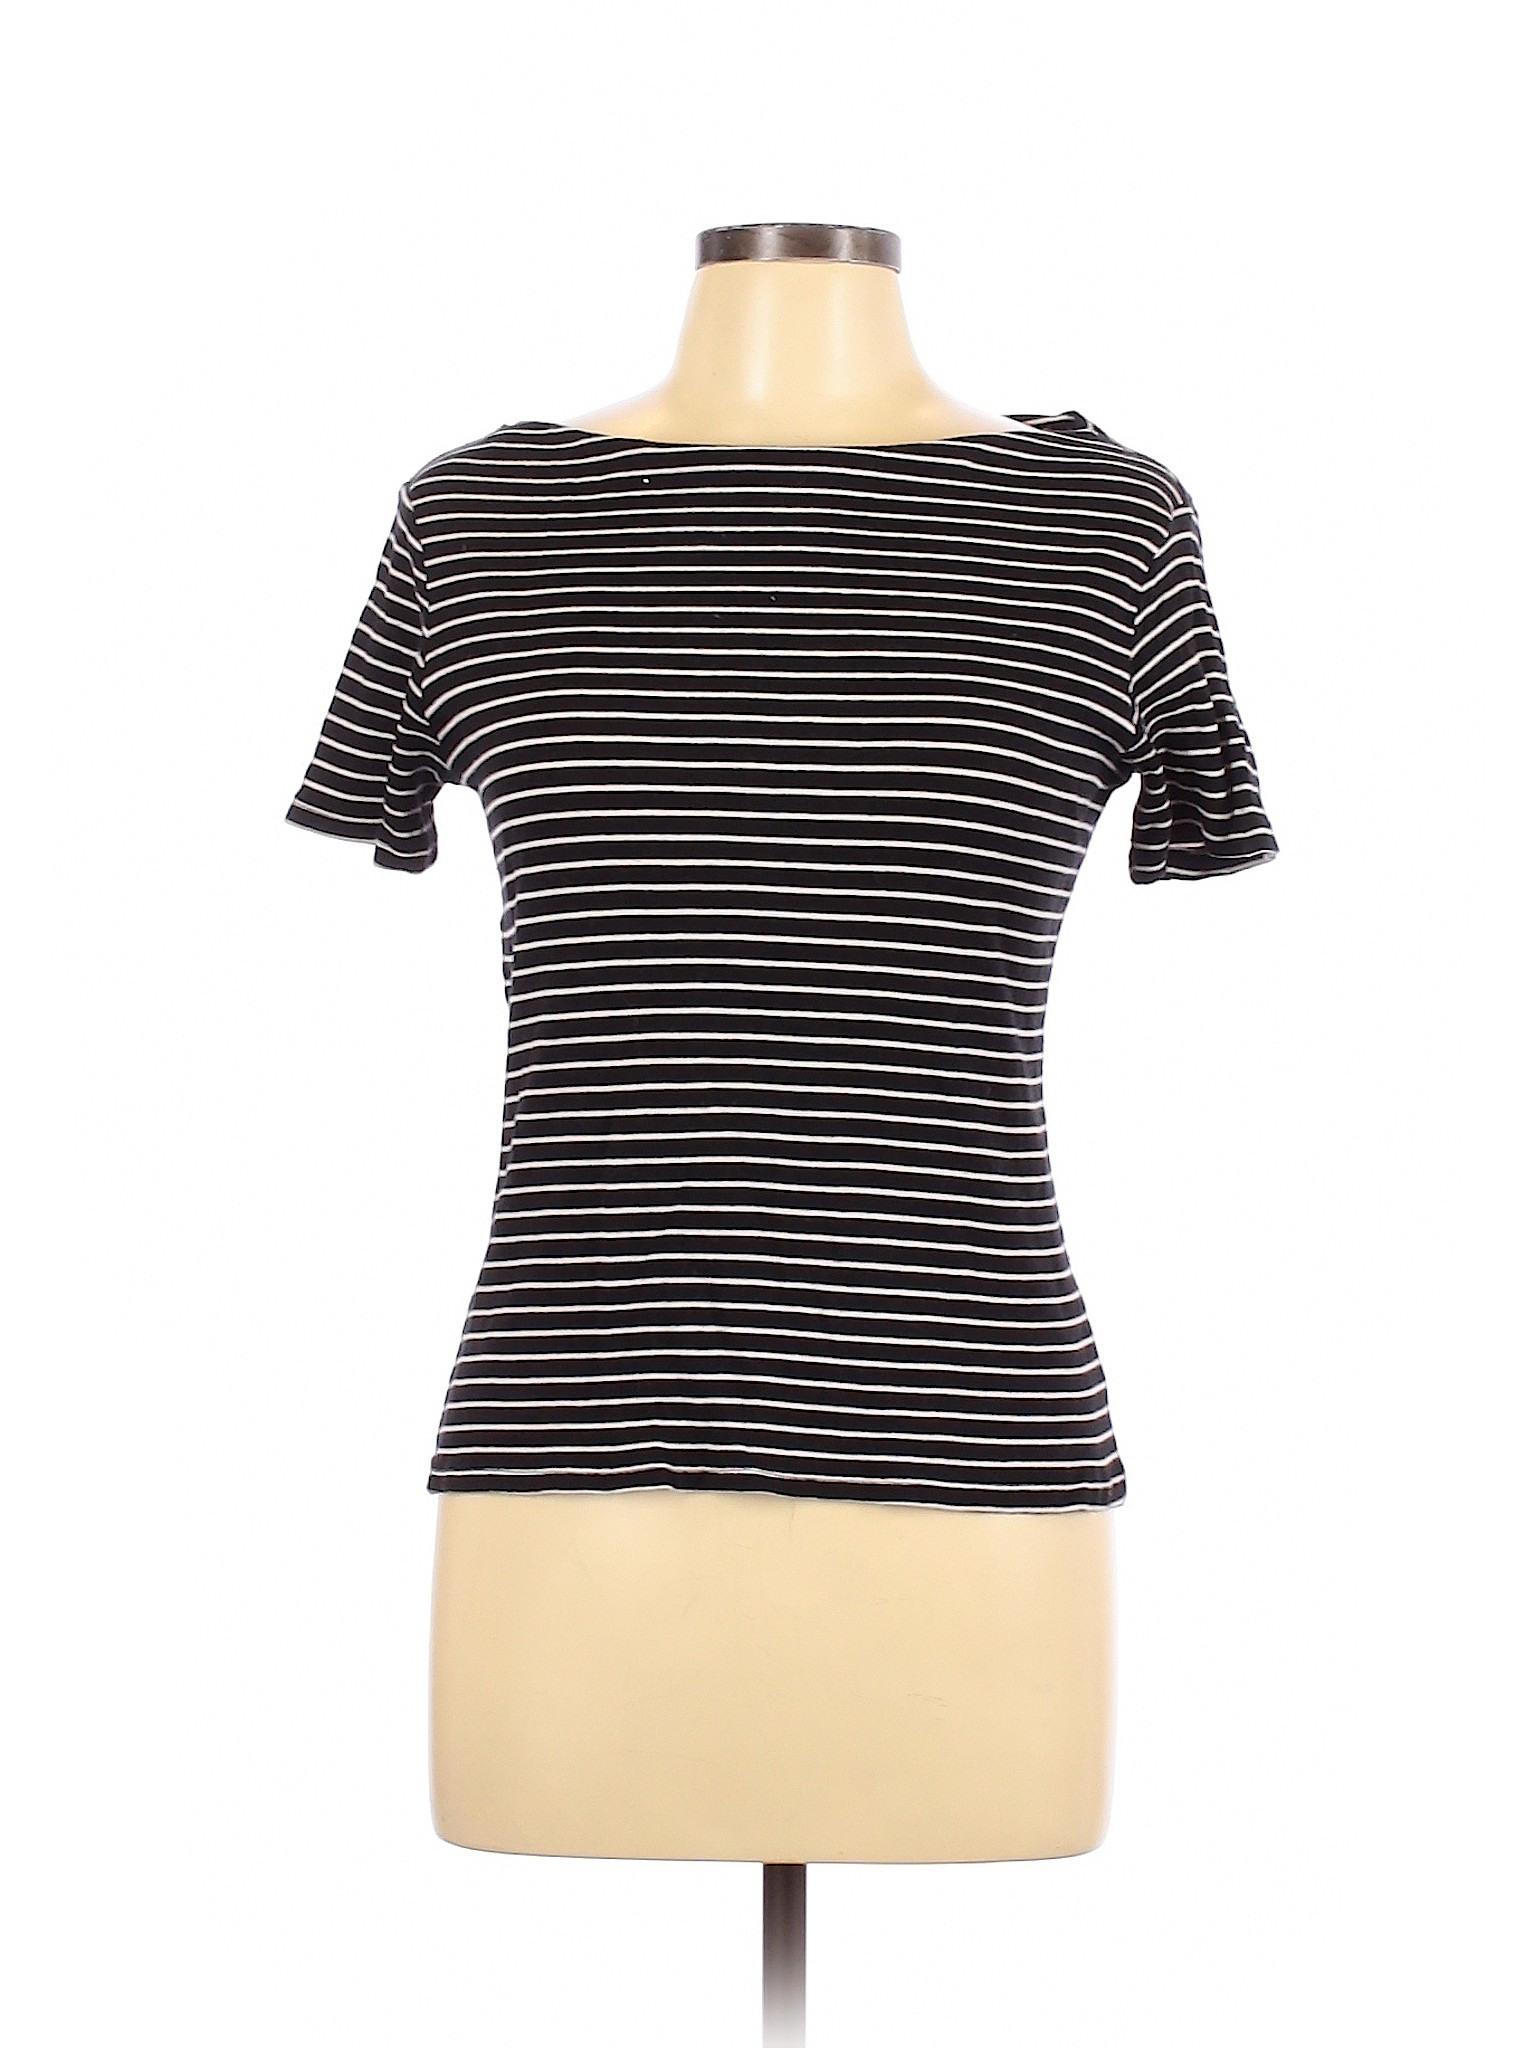 Zara Trf Women Black 3/4 Sleeve Tshirt L  Ebay